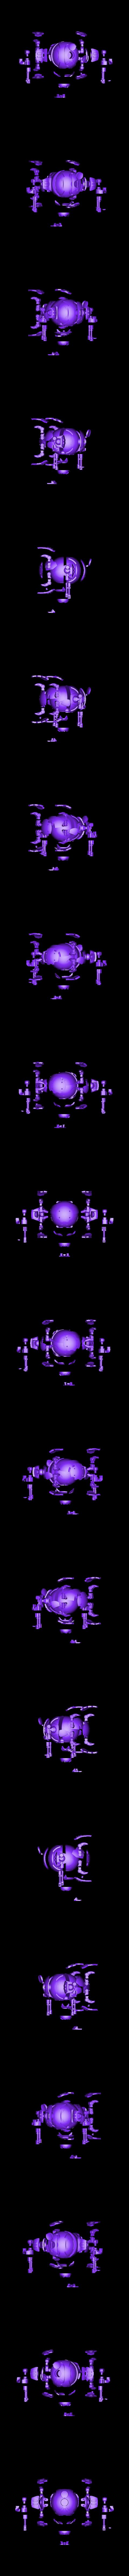 Hammond-Full-Exploded.stl Download STL file Hammond's Wrecking Ball Mech from Overwatch • 3D printer template, FunbieStudios